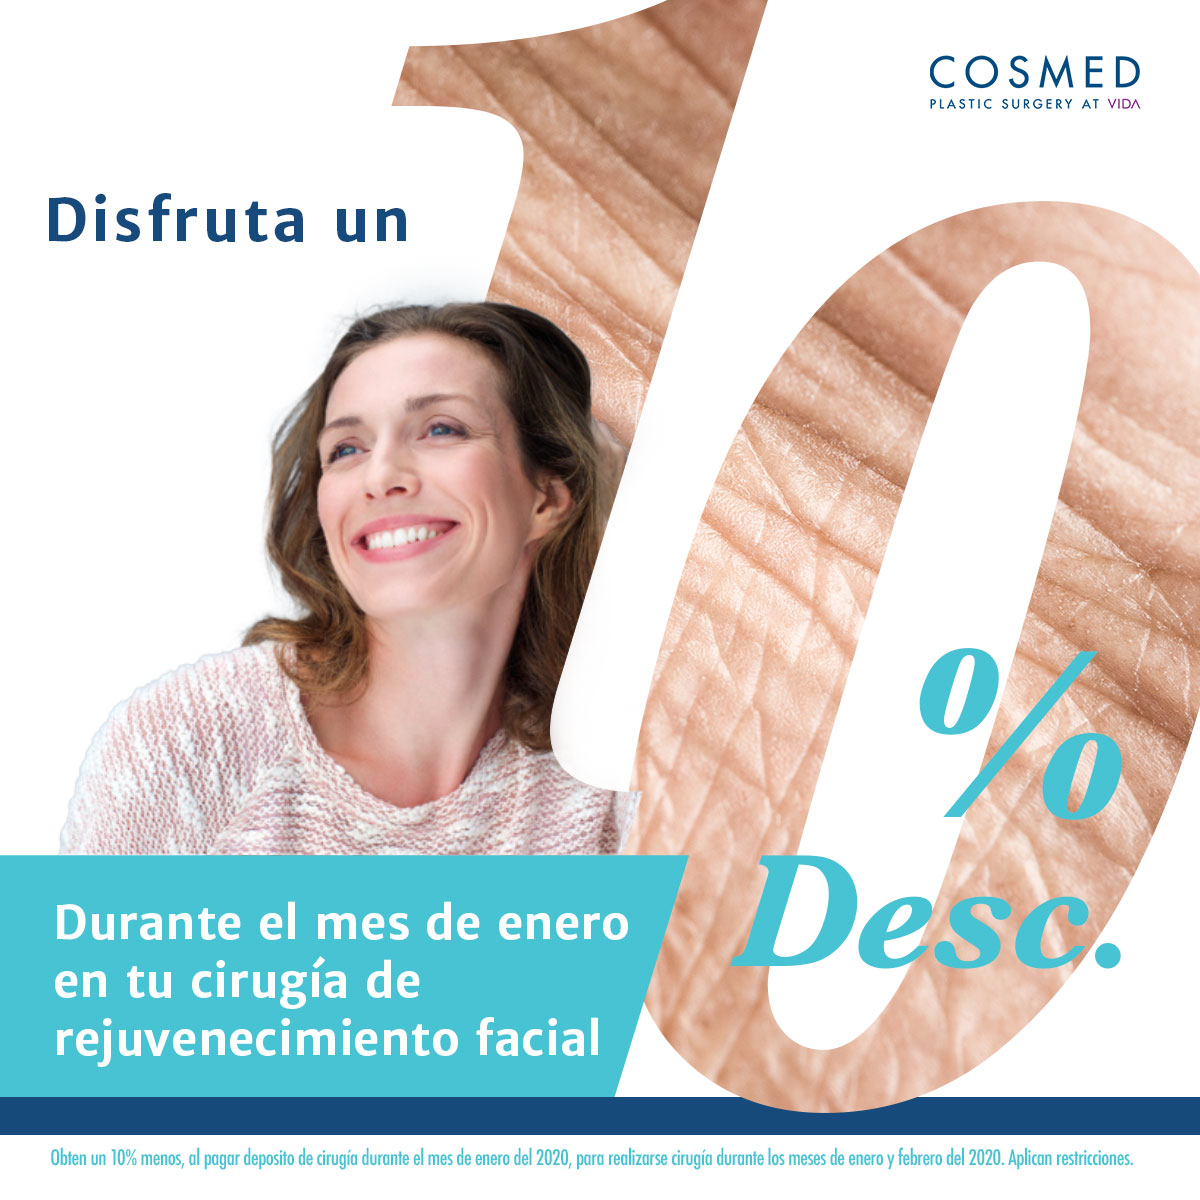 rejuvenecimiento facial tijuana promocion enero 2020